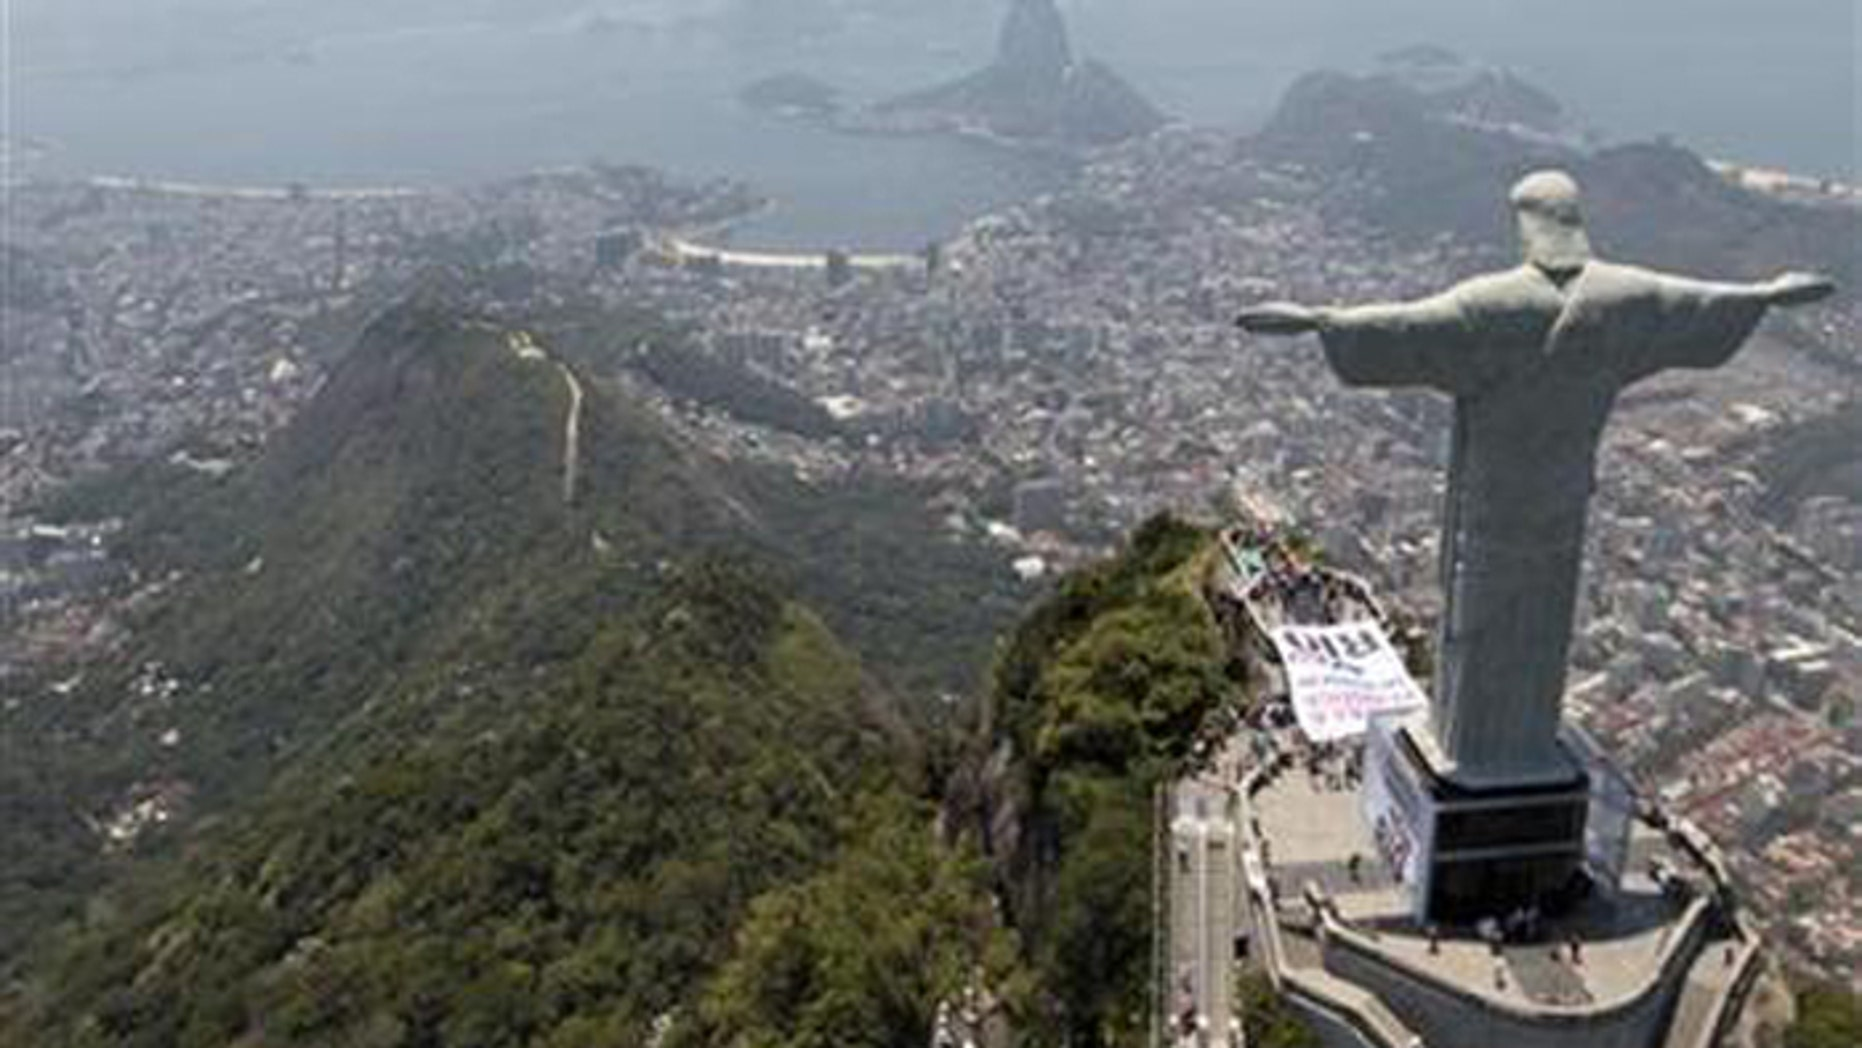 Christ the Redeemer statue that towers above Rio de Janeiro.